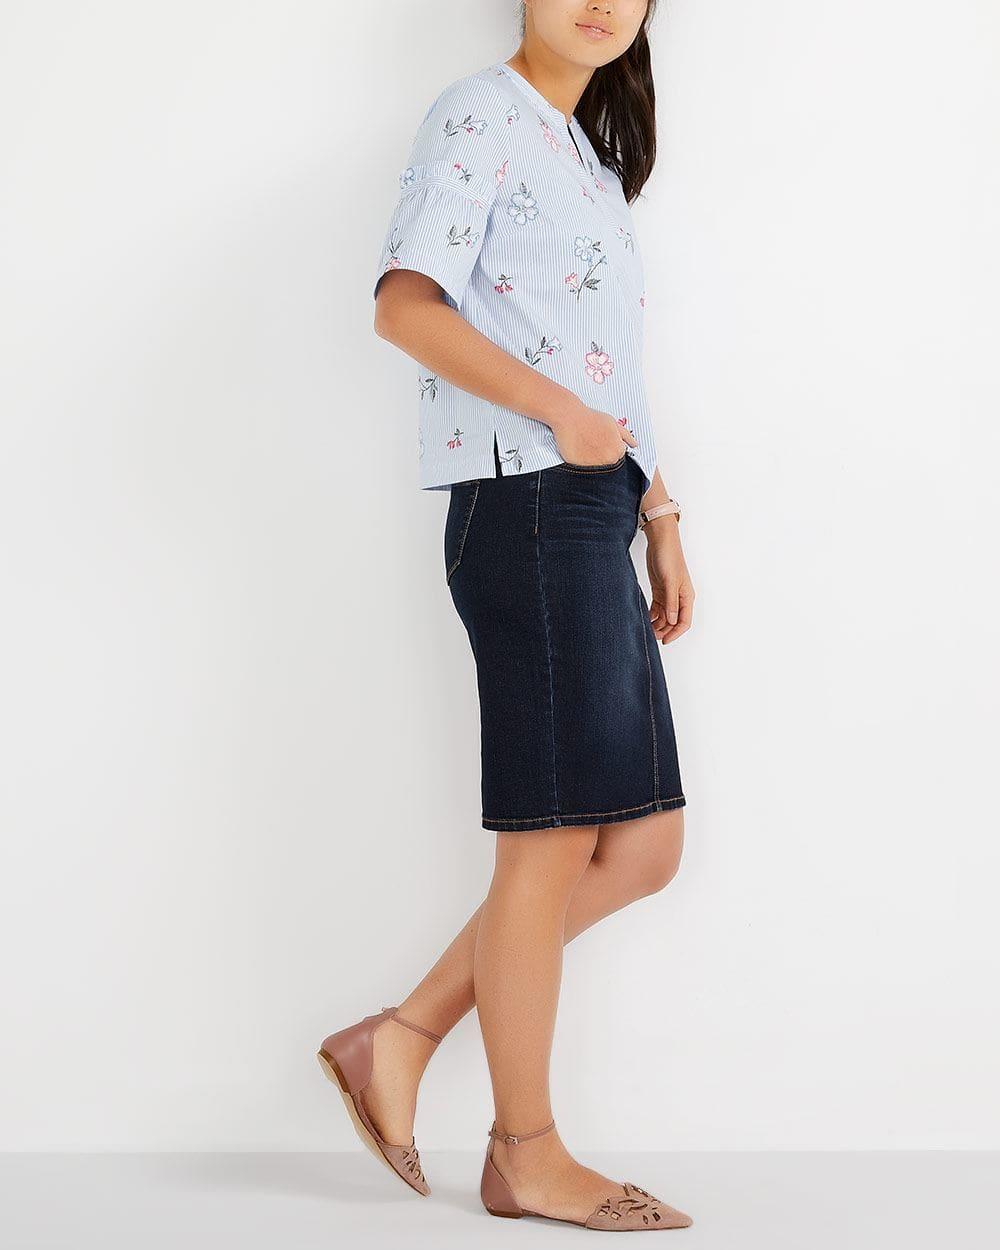 5-Pocket Denim Pencil Skirt